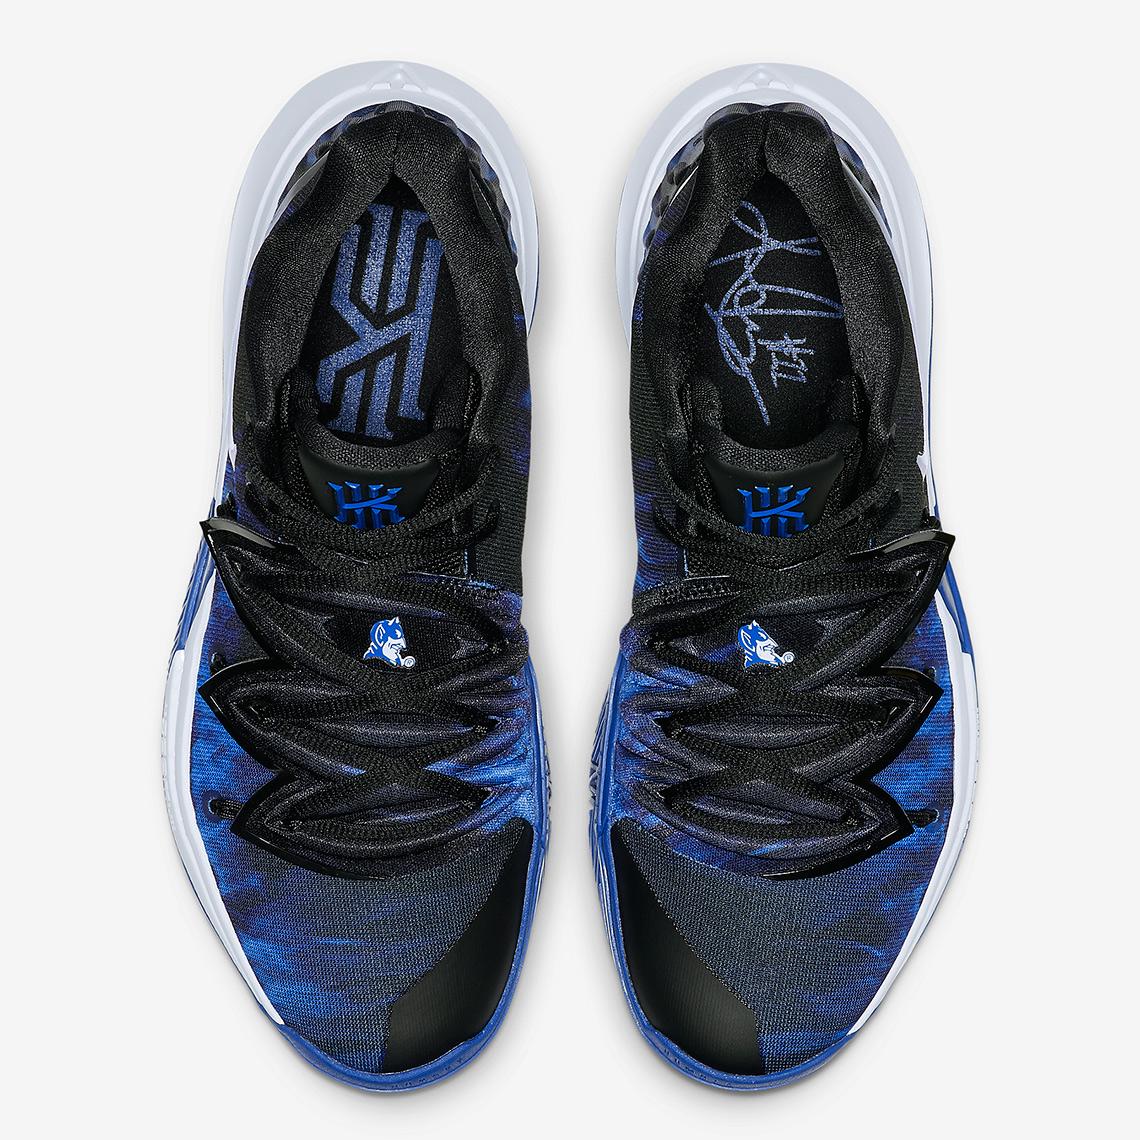 quality design f41a3 156f8 Nike Kyrie 5 Duke PE CI0306-901 Release Info   SneakerNews.com